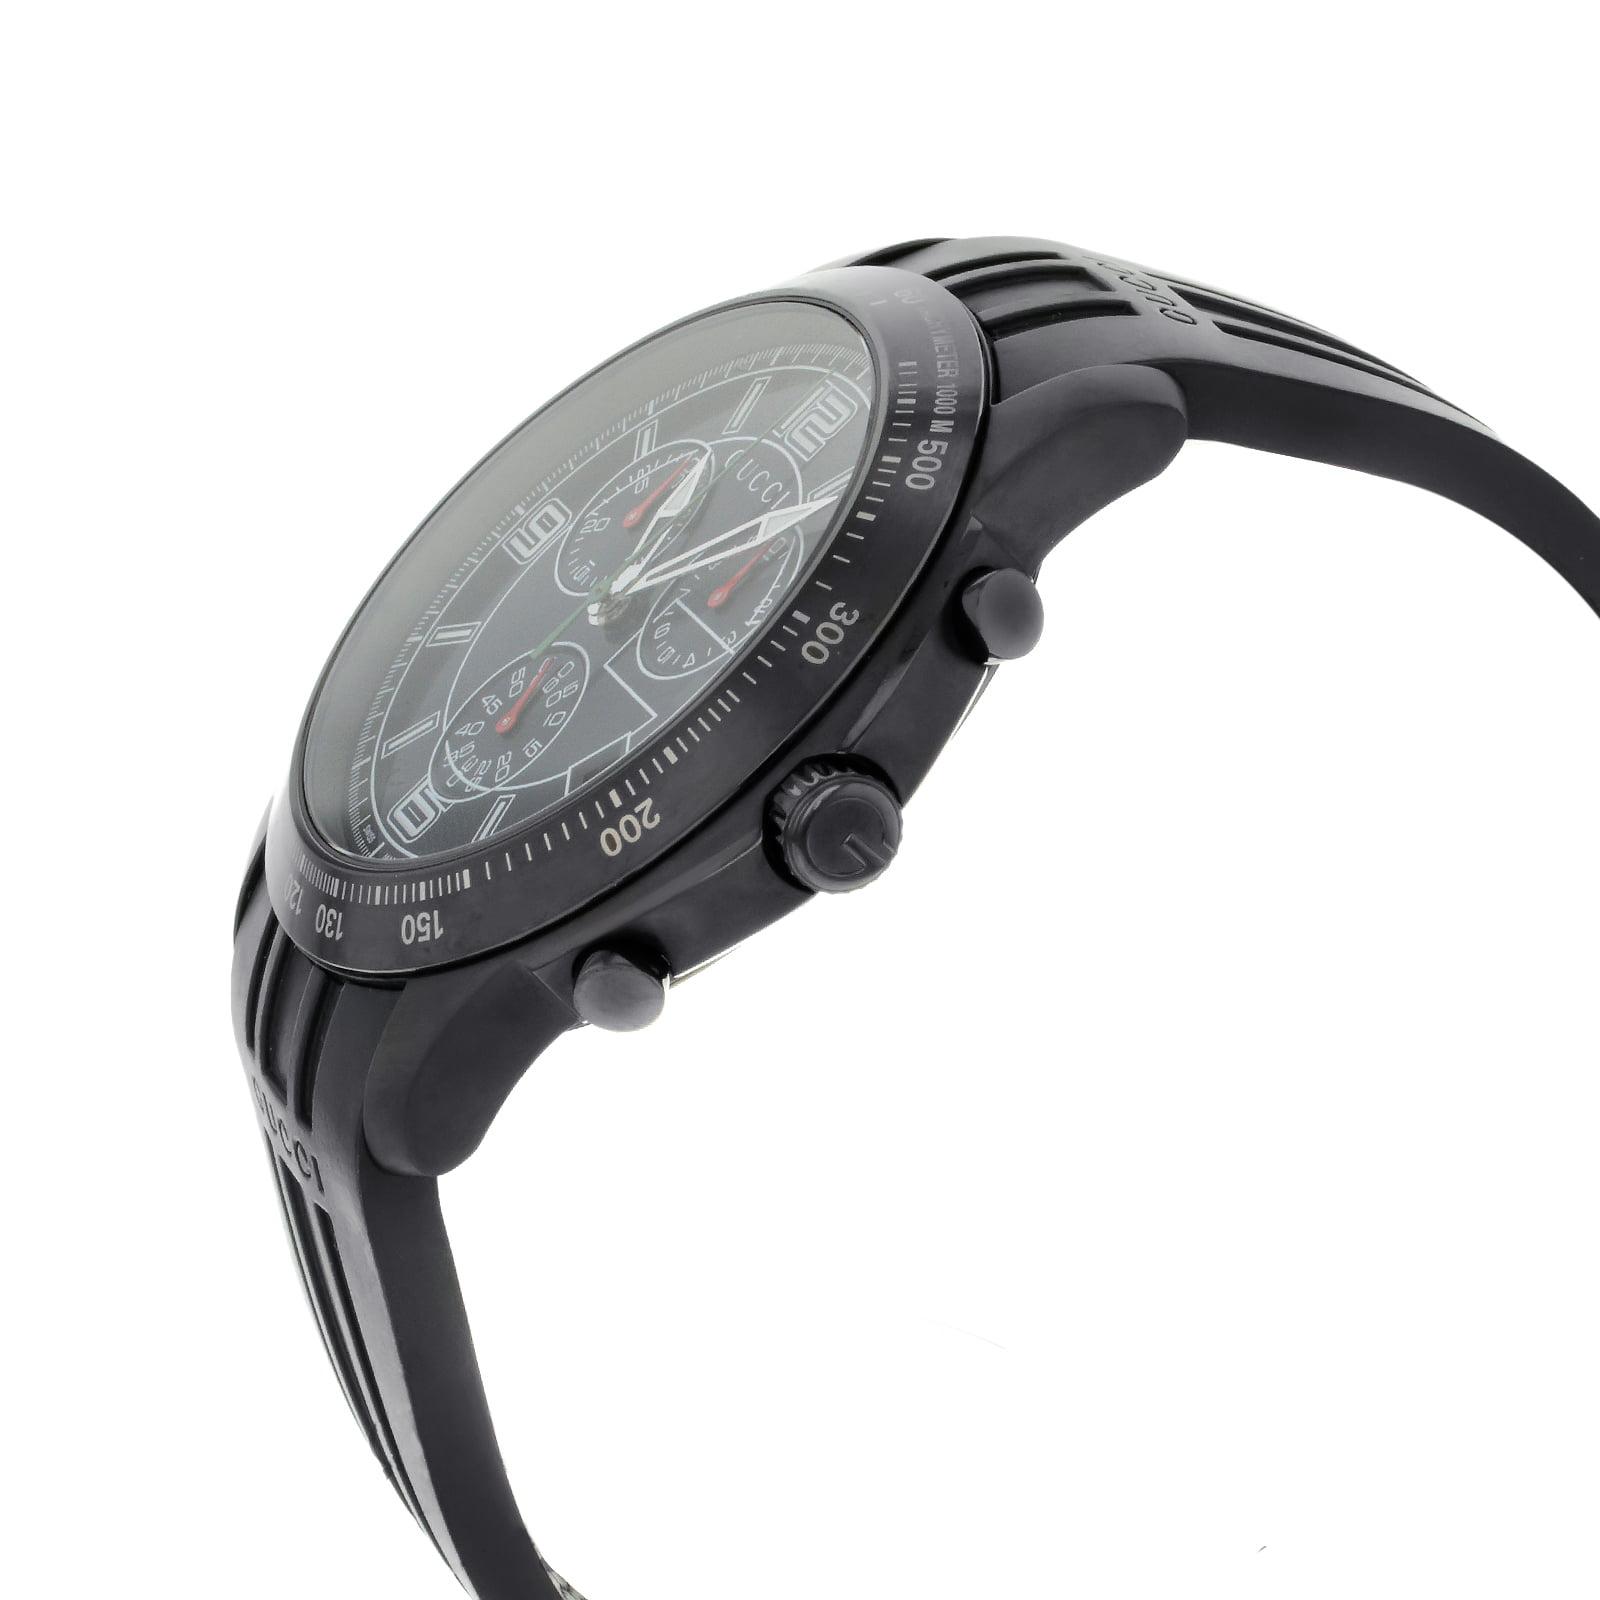 4de75c780 Gucci - Gucci 126 YA126206 G-Timeless Stainless Steel Chronograph Quartz  Men s Watch (Pre-owned) - Walmart.com